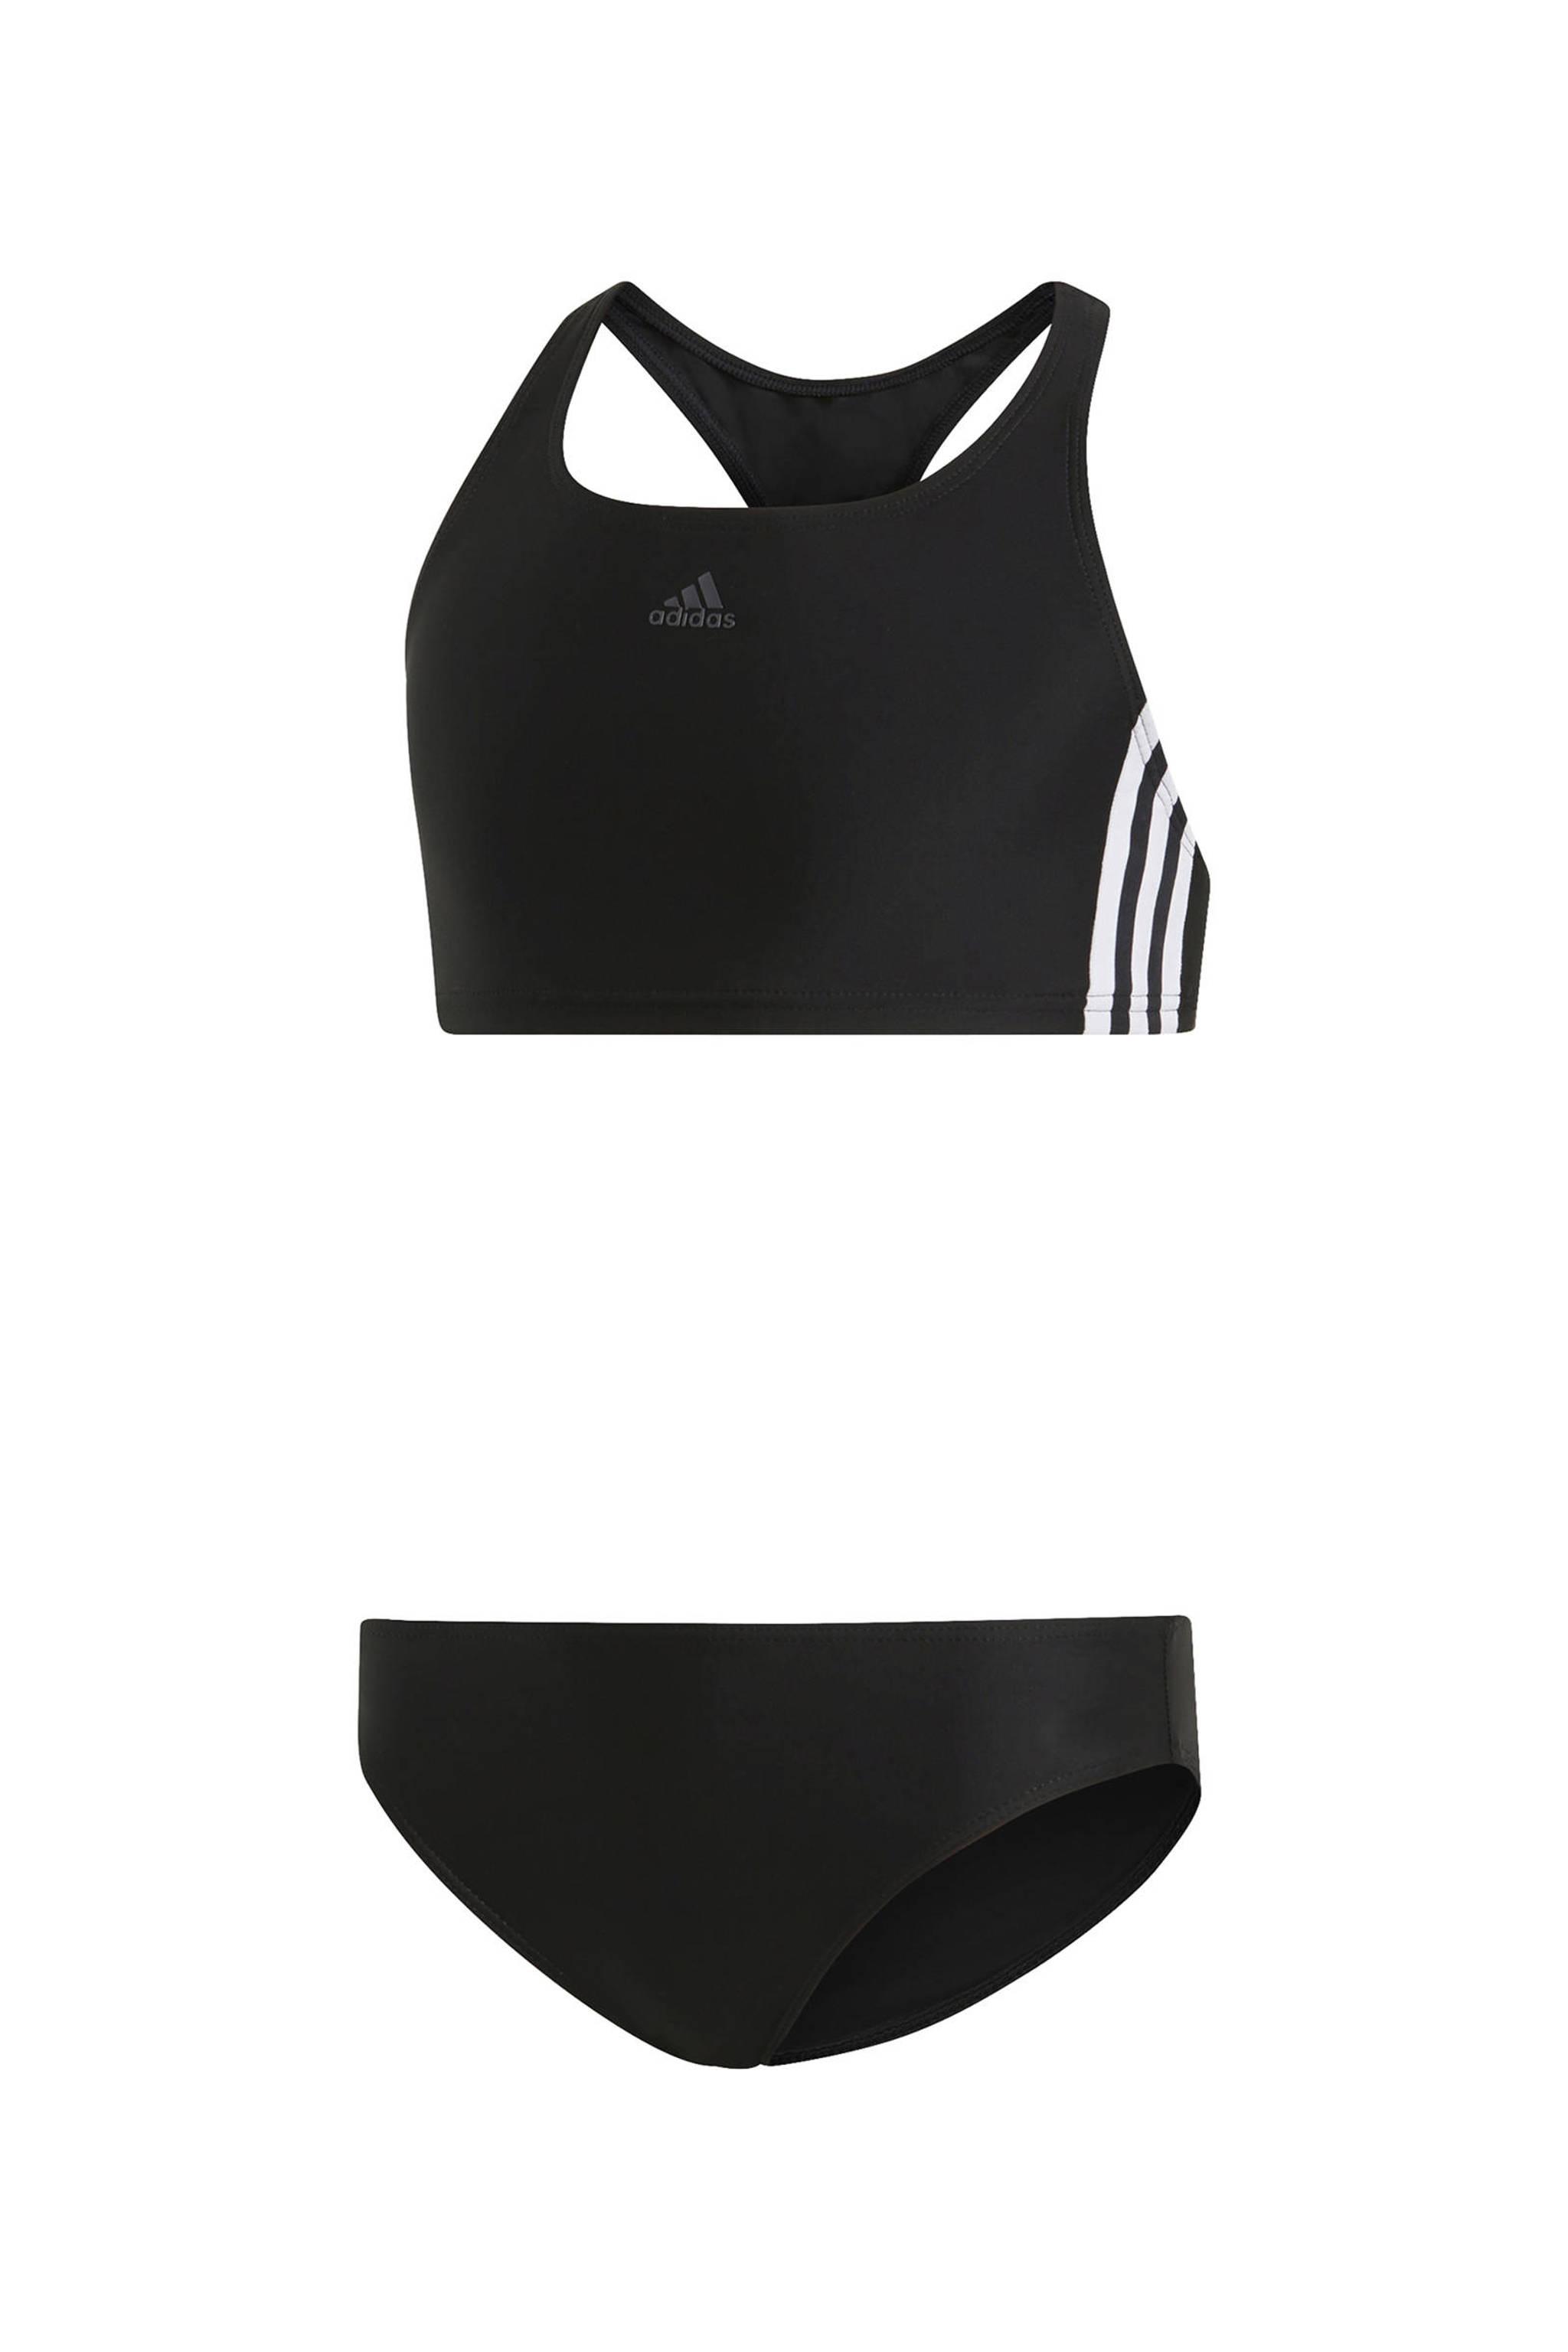 hot sale quite nice factory authentic infinitex crop bikini zwart